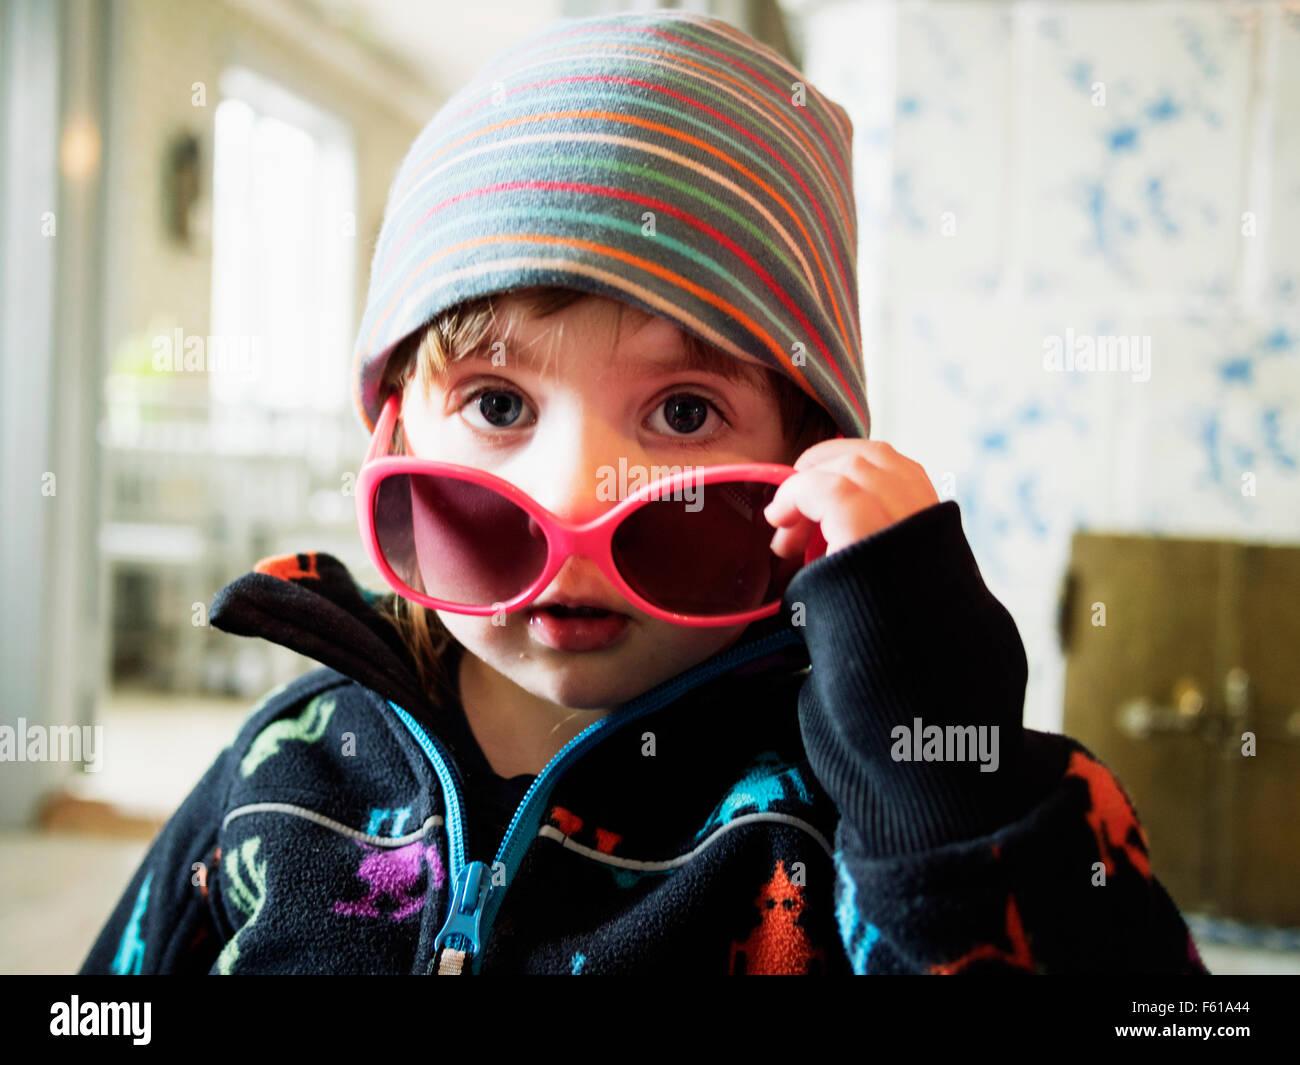 b3303dda460 Little Girl Wearing Sunglasses Stock Photos   Little Girl Wearing ...